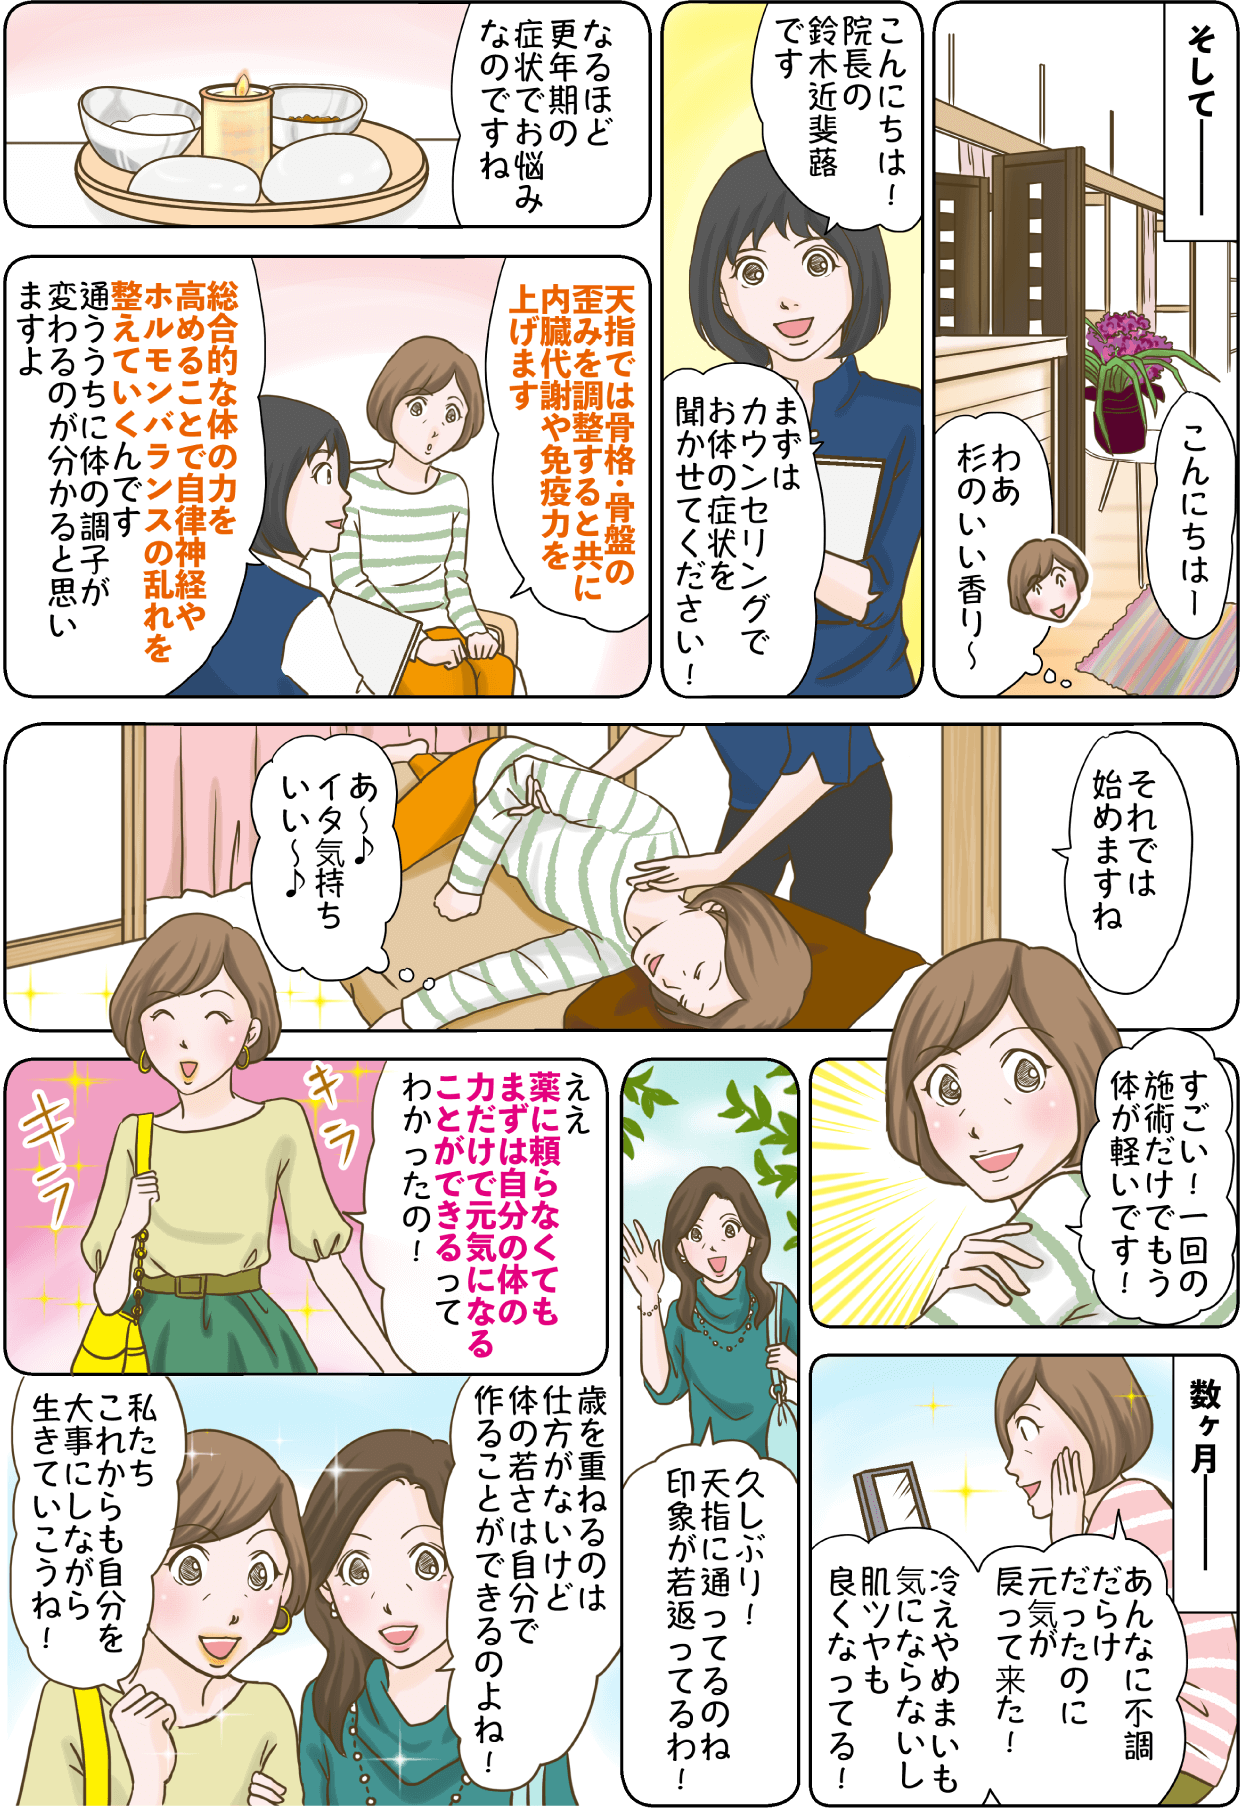 プレ更年期・更年期障害漫画2